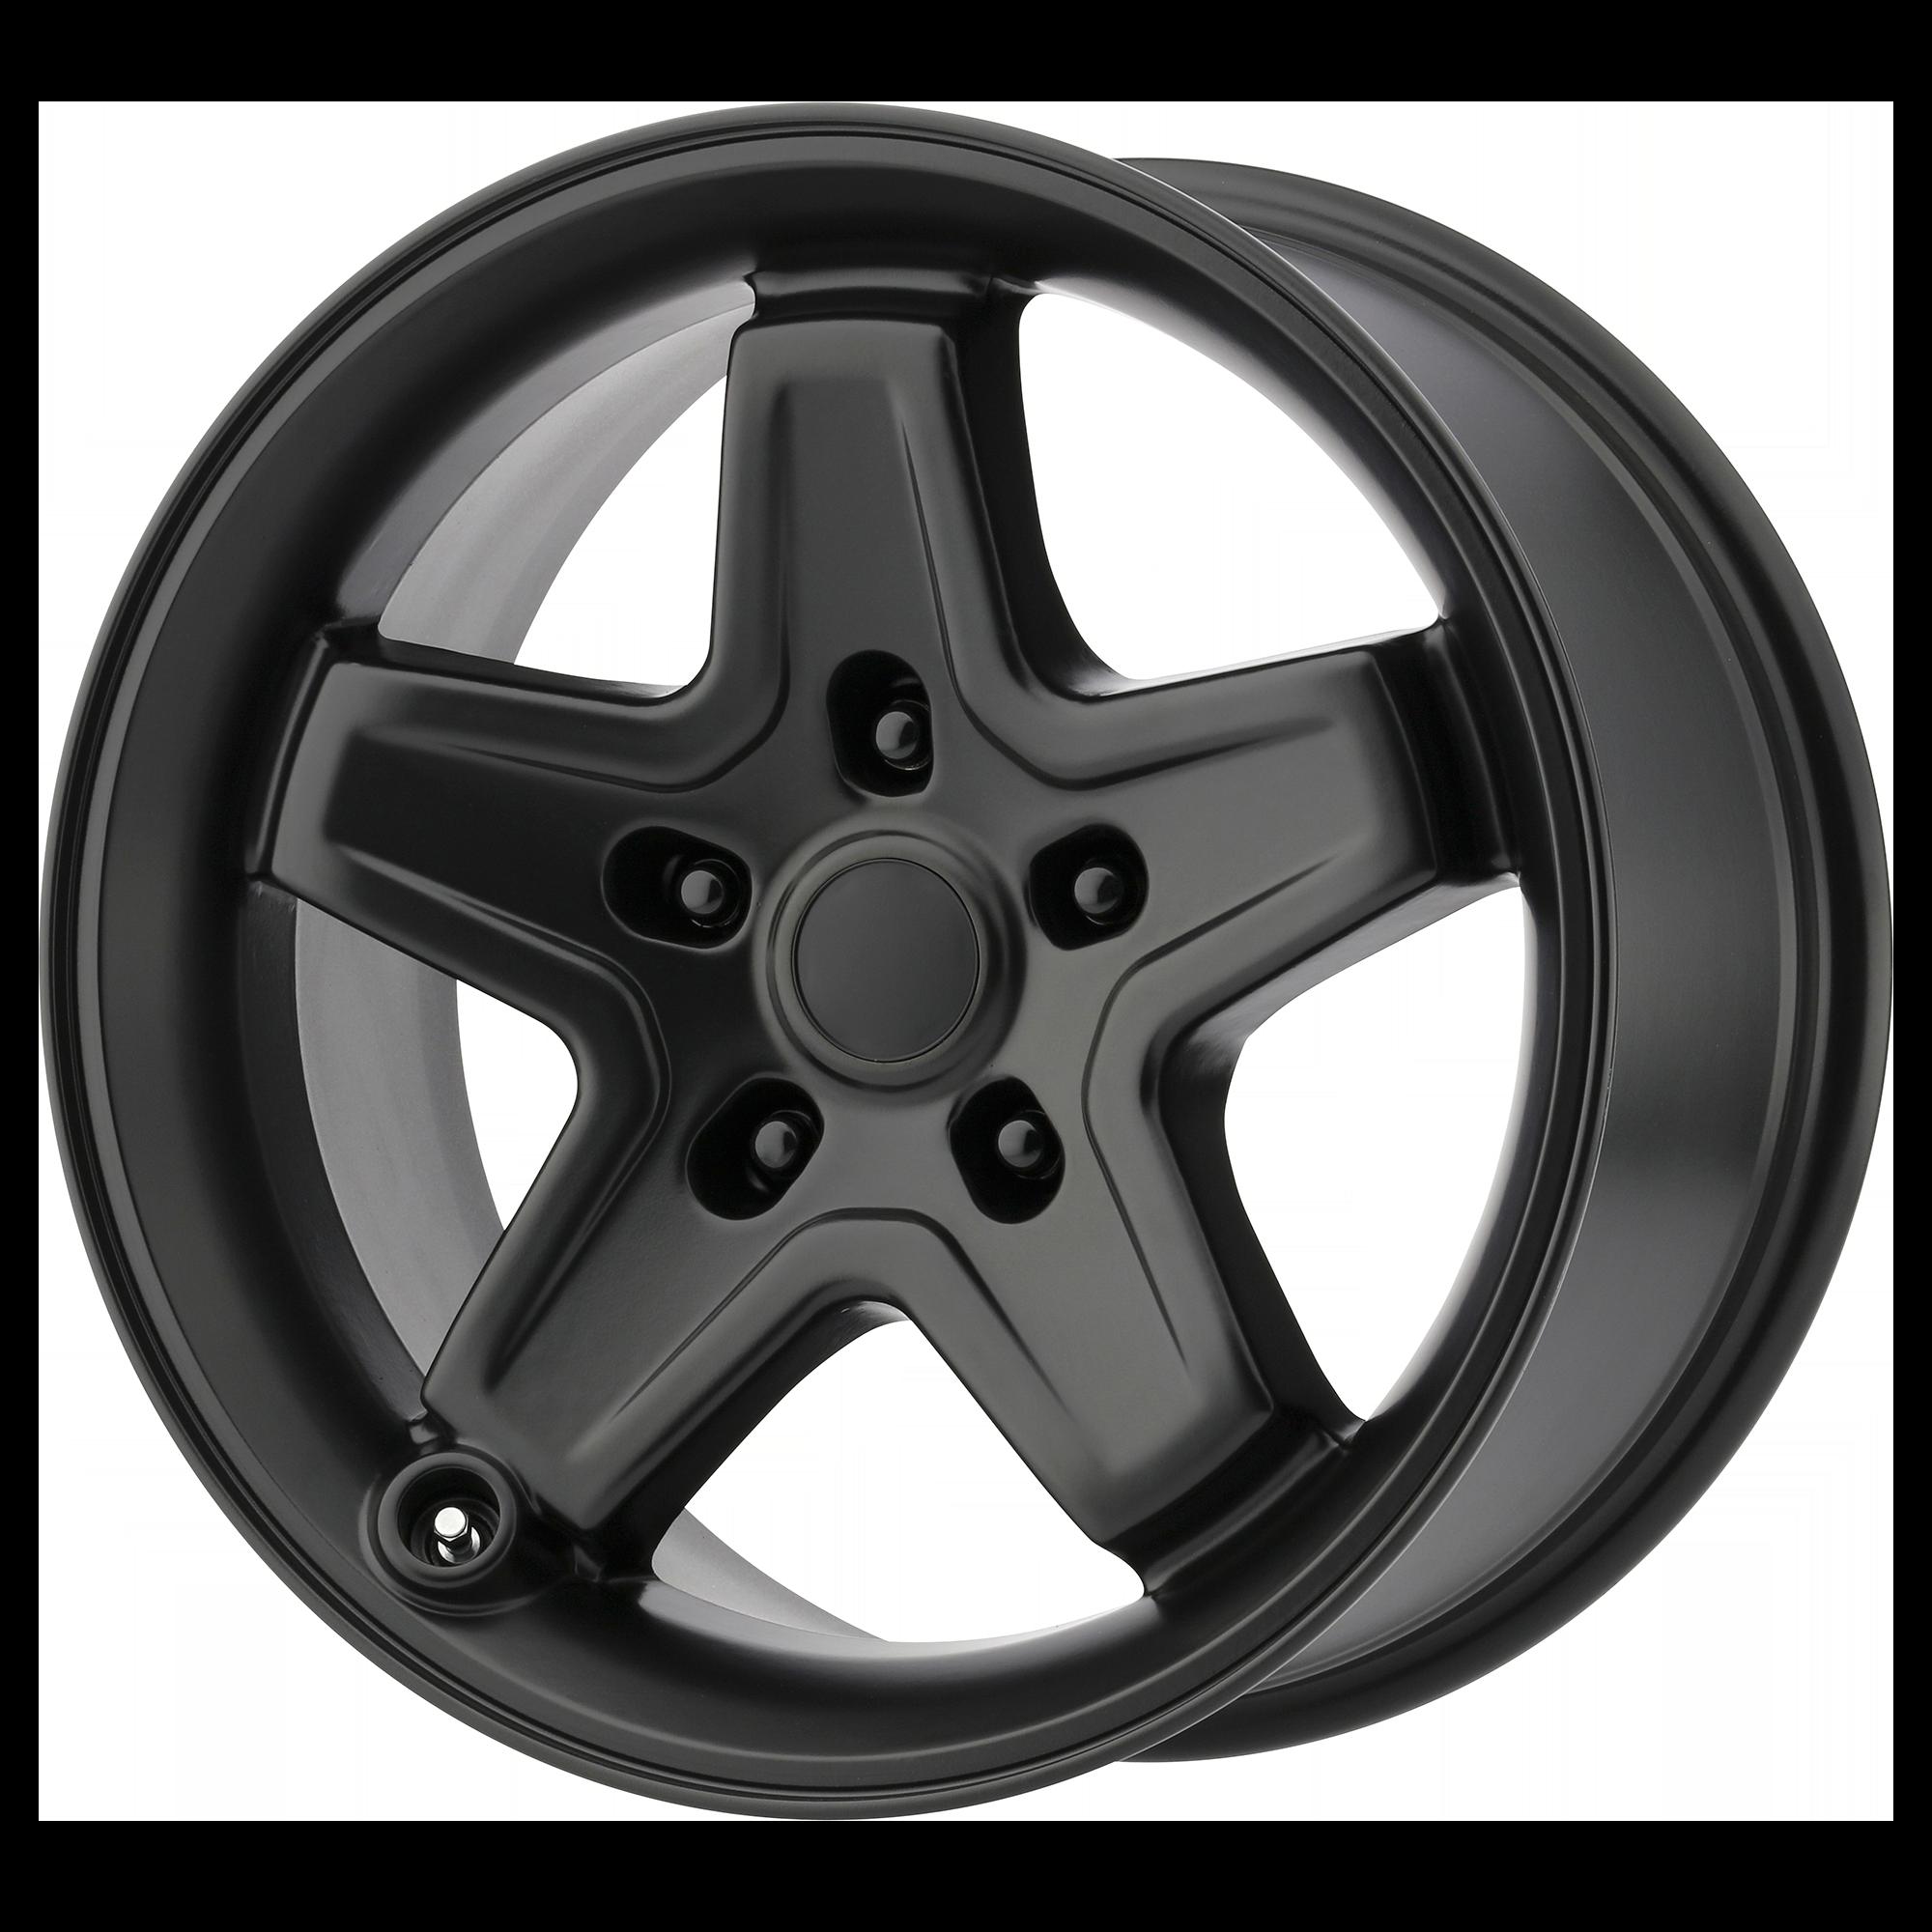 Details about Jeep Wrangler AEV Pintler Style Wheel 17x8 5 +10 Satin Black  5x127 5x5 (QTY 2)